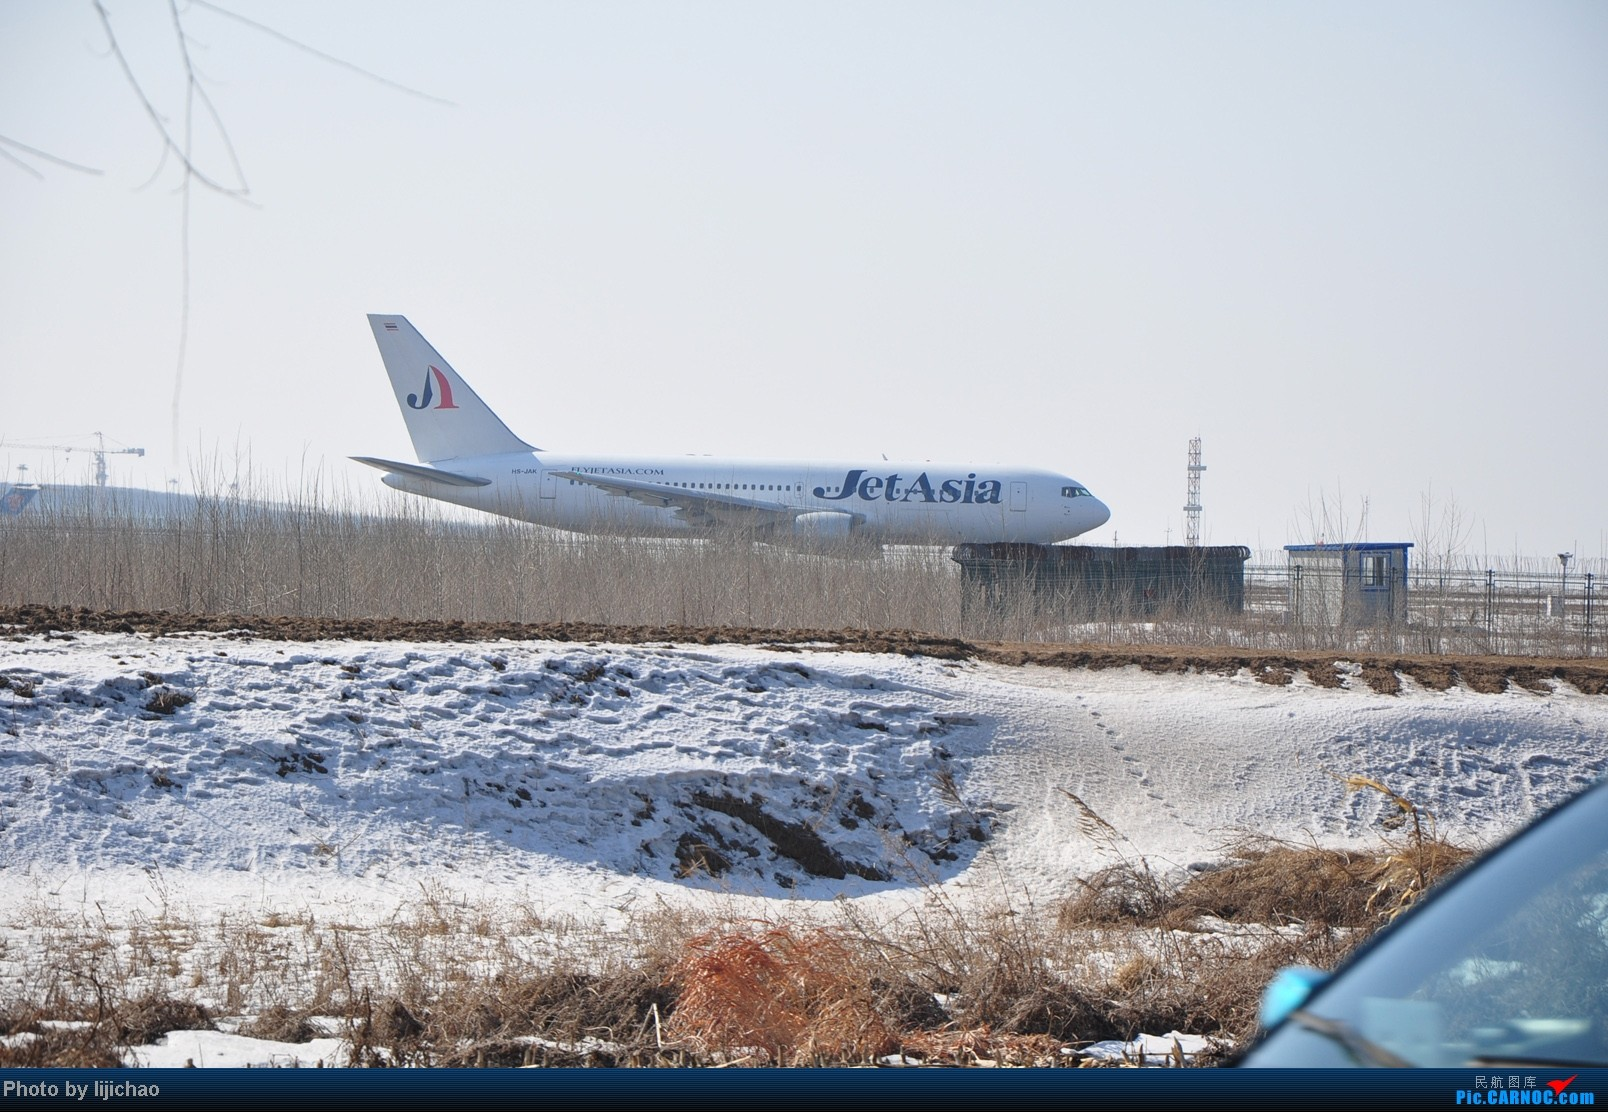 Re:[原创]沈阳桃仙机场跑道尽头随拍 BOEING 767-200 HS-JAK